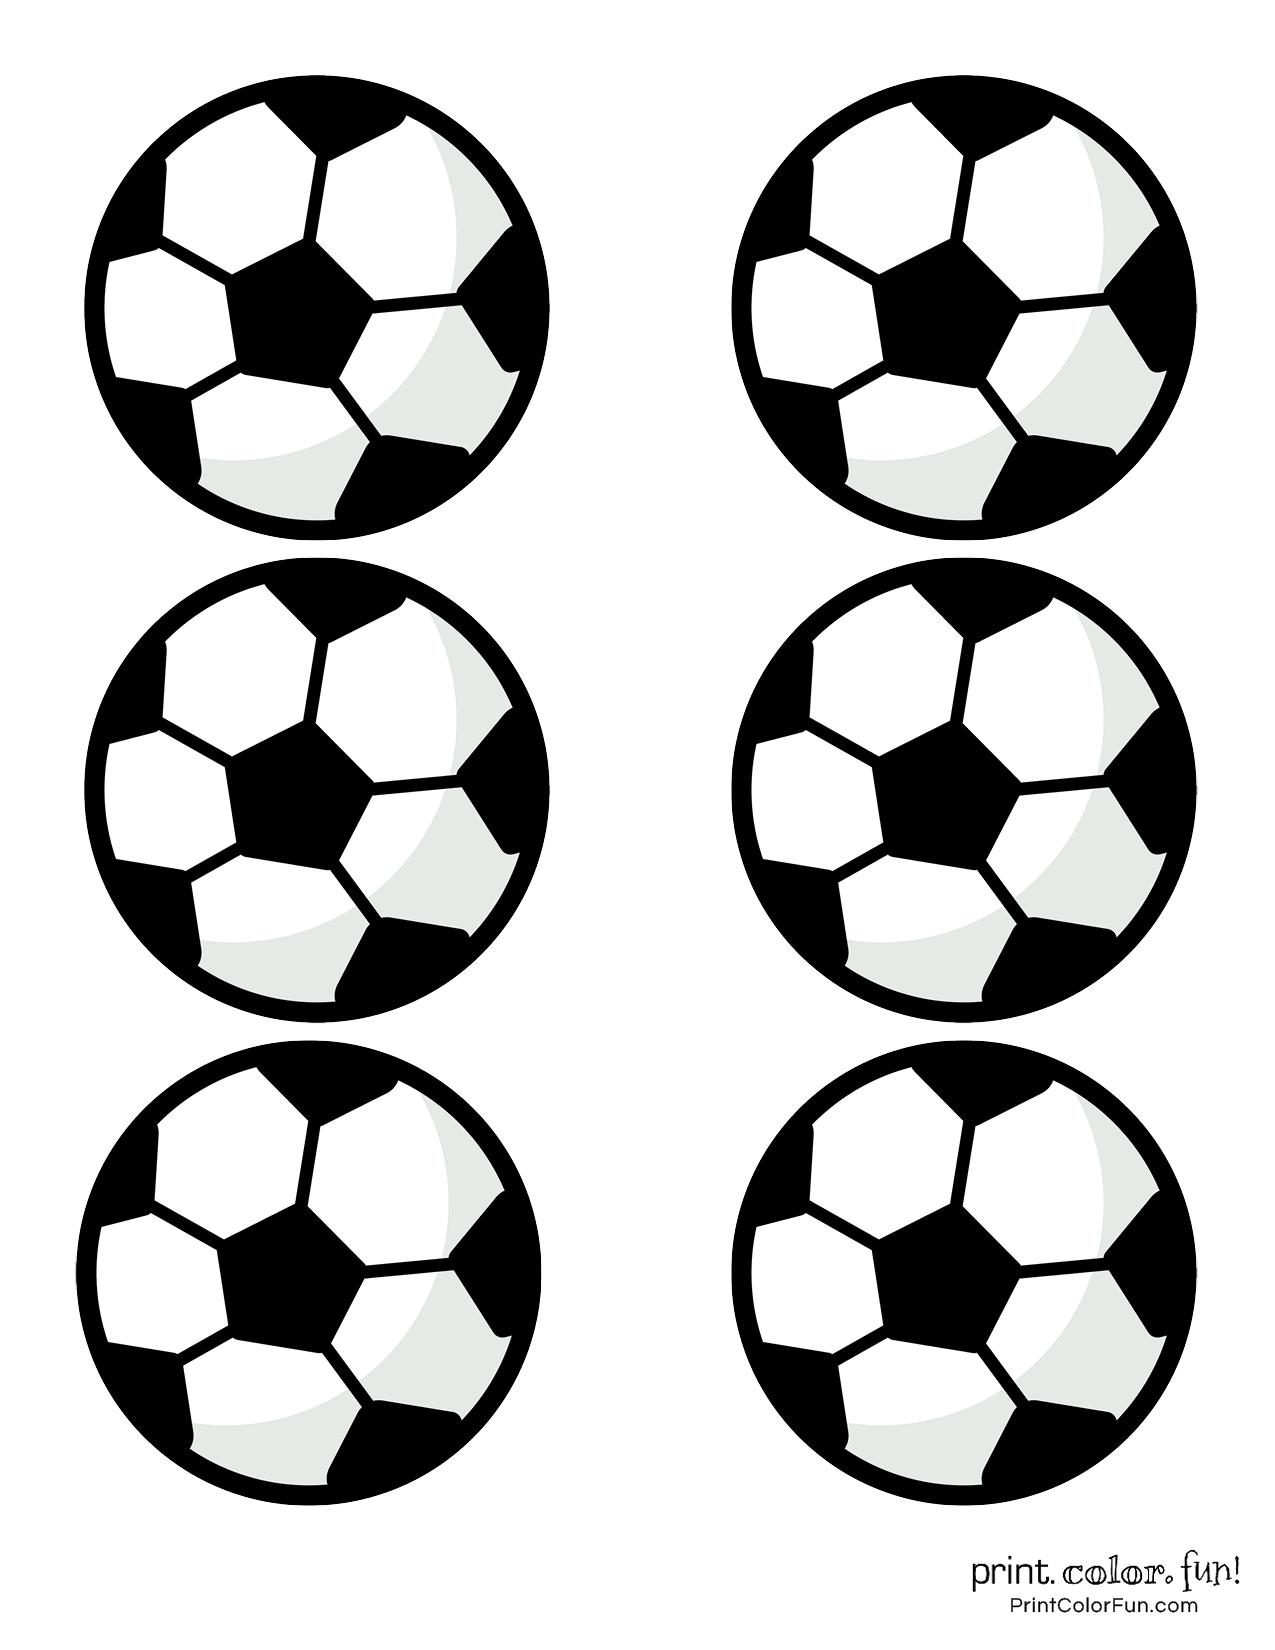 photo regarding Printable Soccer Ball known as Football ball coloring web pages coloring webpage - Print. Shade. Enjoyable!